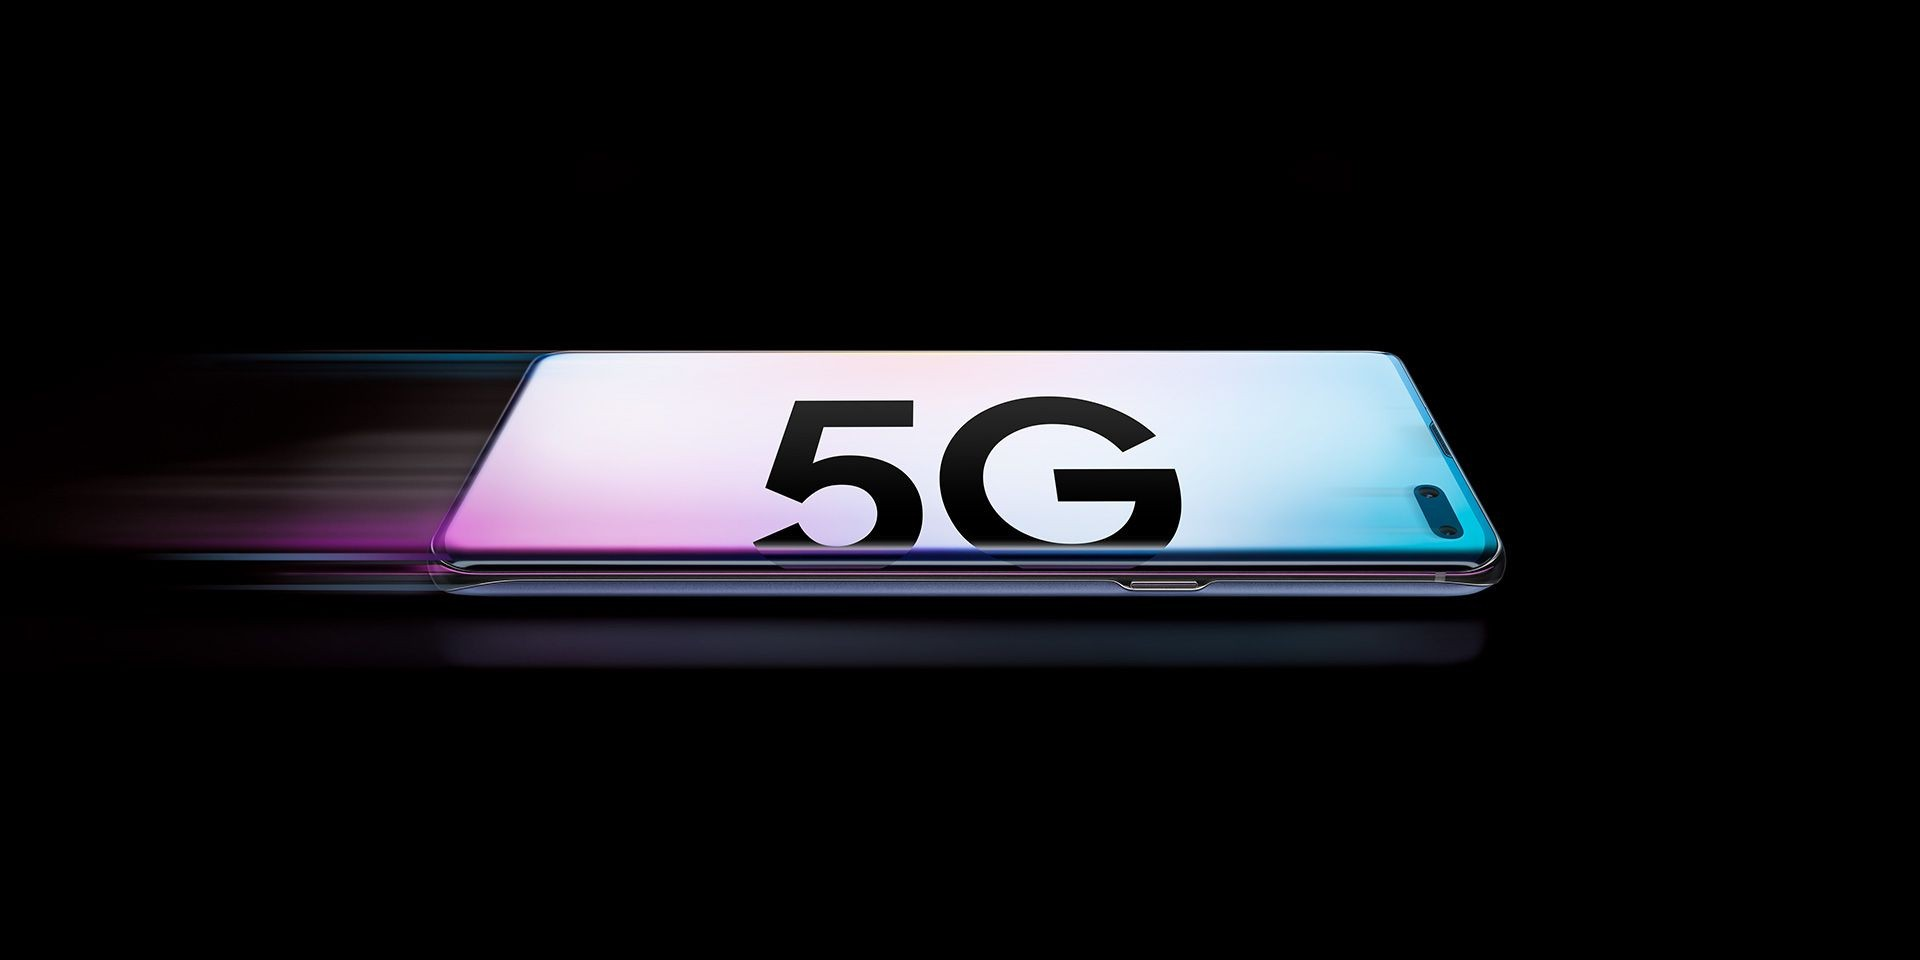 Samsung Galaxy S10 5G One UI 2.0